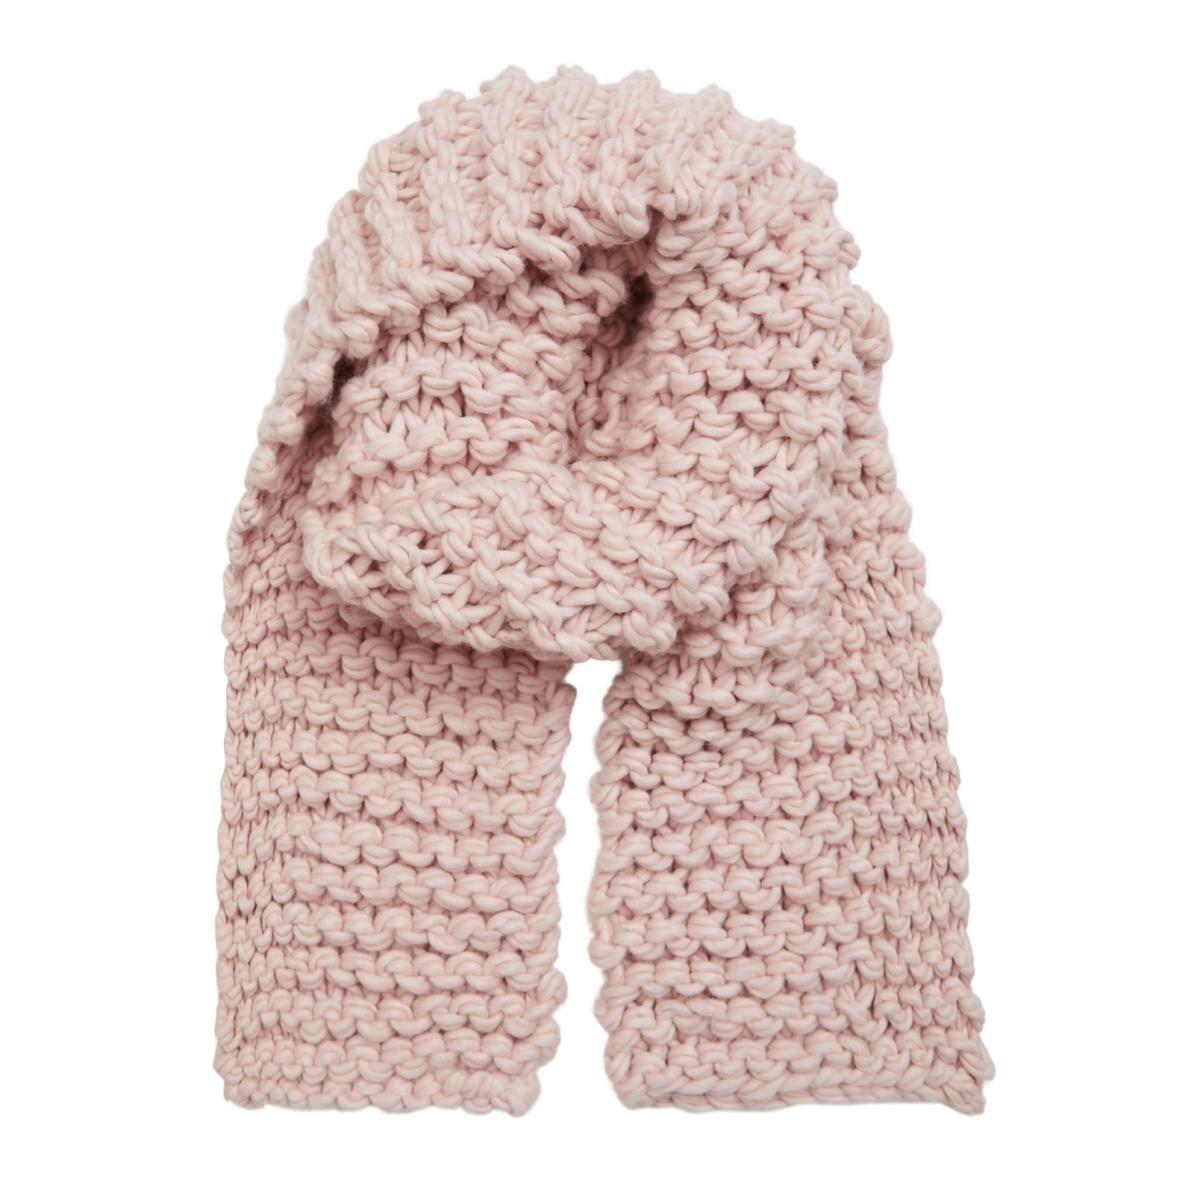 vieaster heavy knit scarf 14042930 vila sjaal peach whip